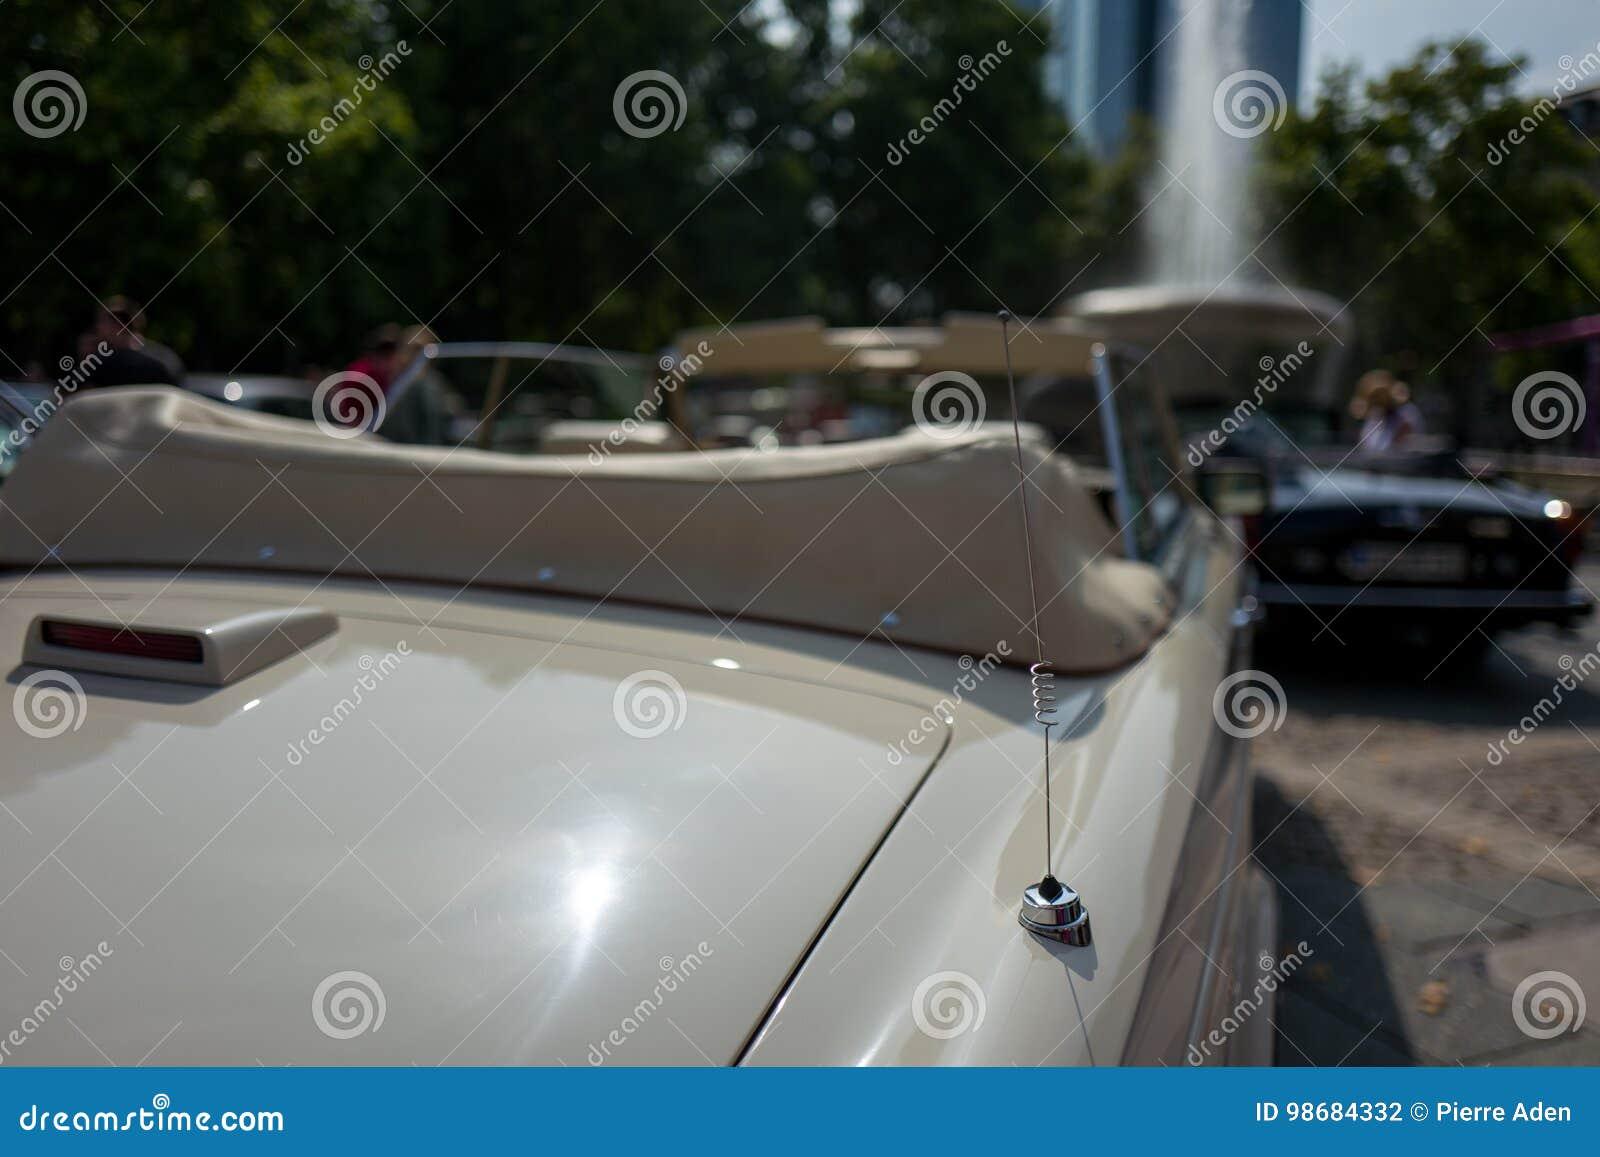 Antenna Of Vintage Car Stock Photo Image Of Motor Prestigious